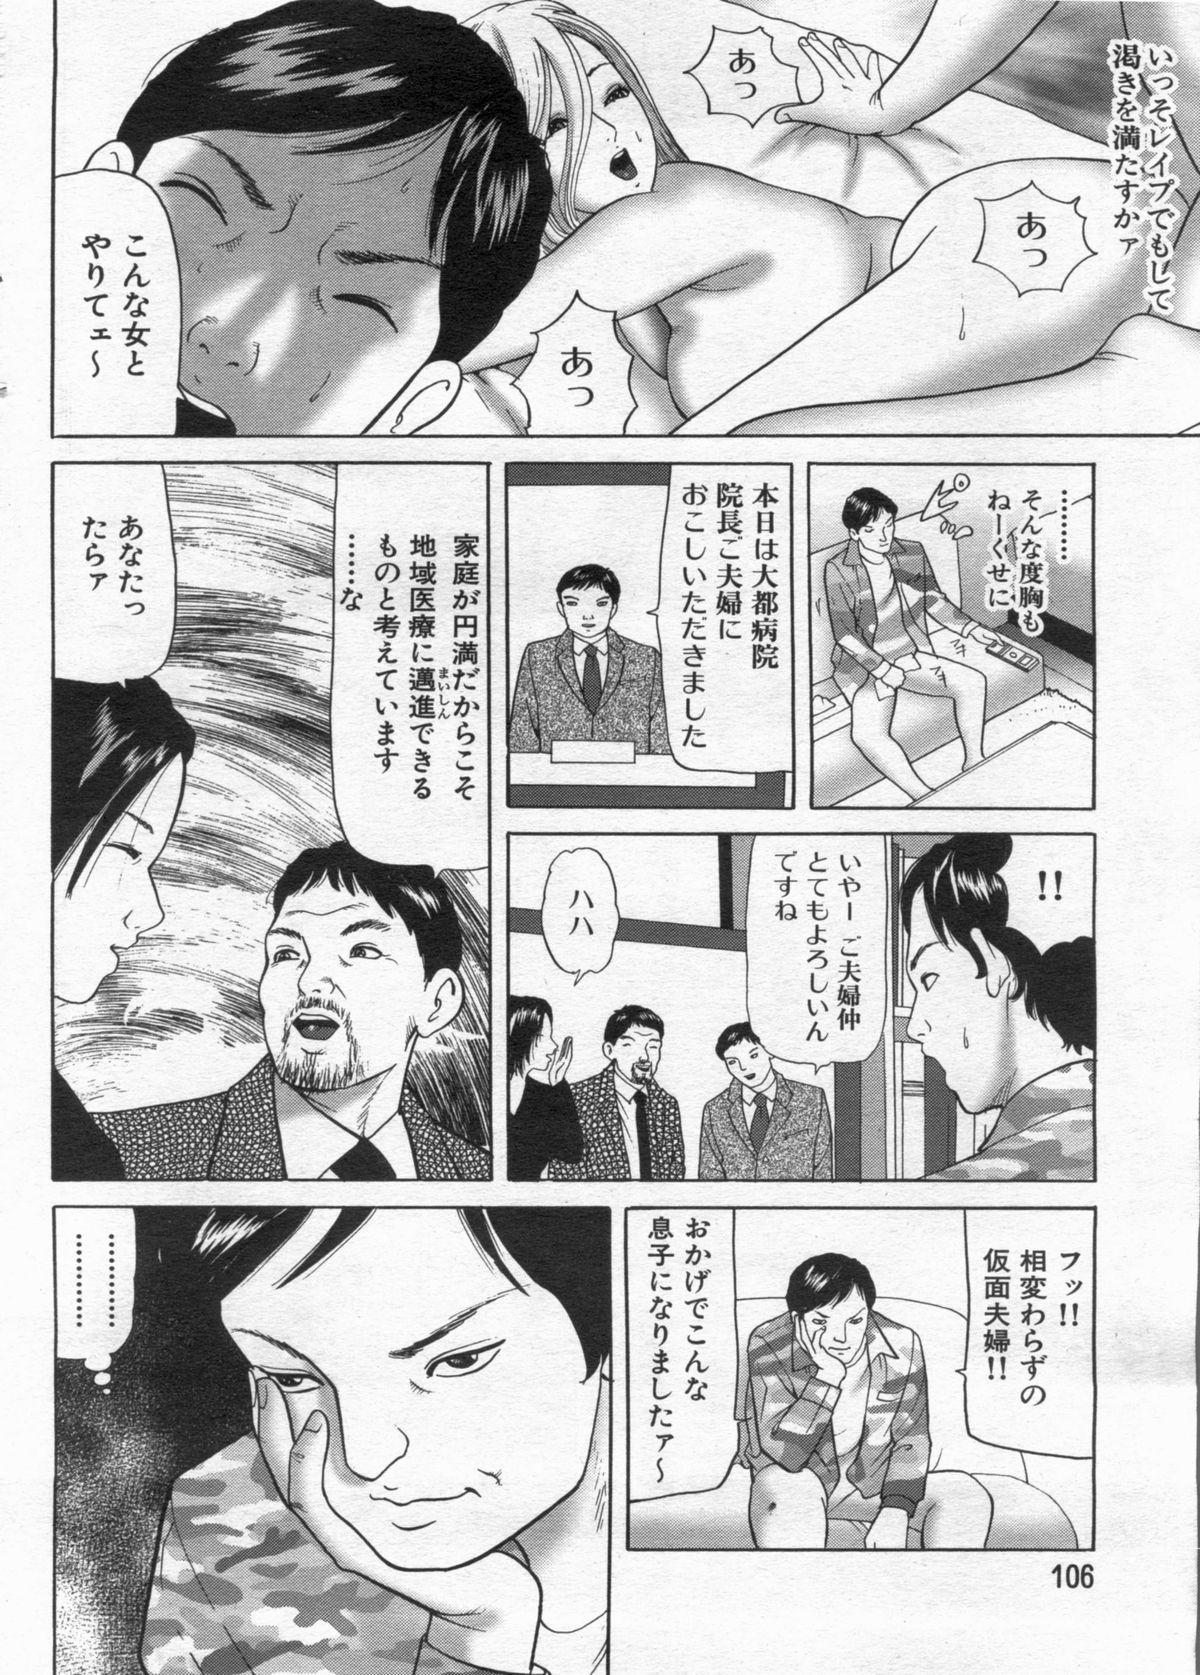 Manga Bon 2013-02 105